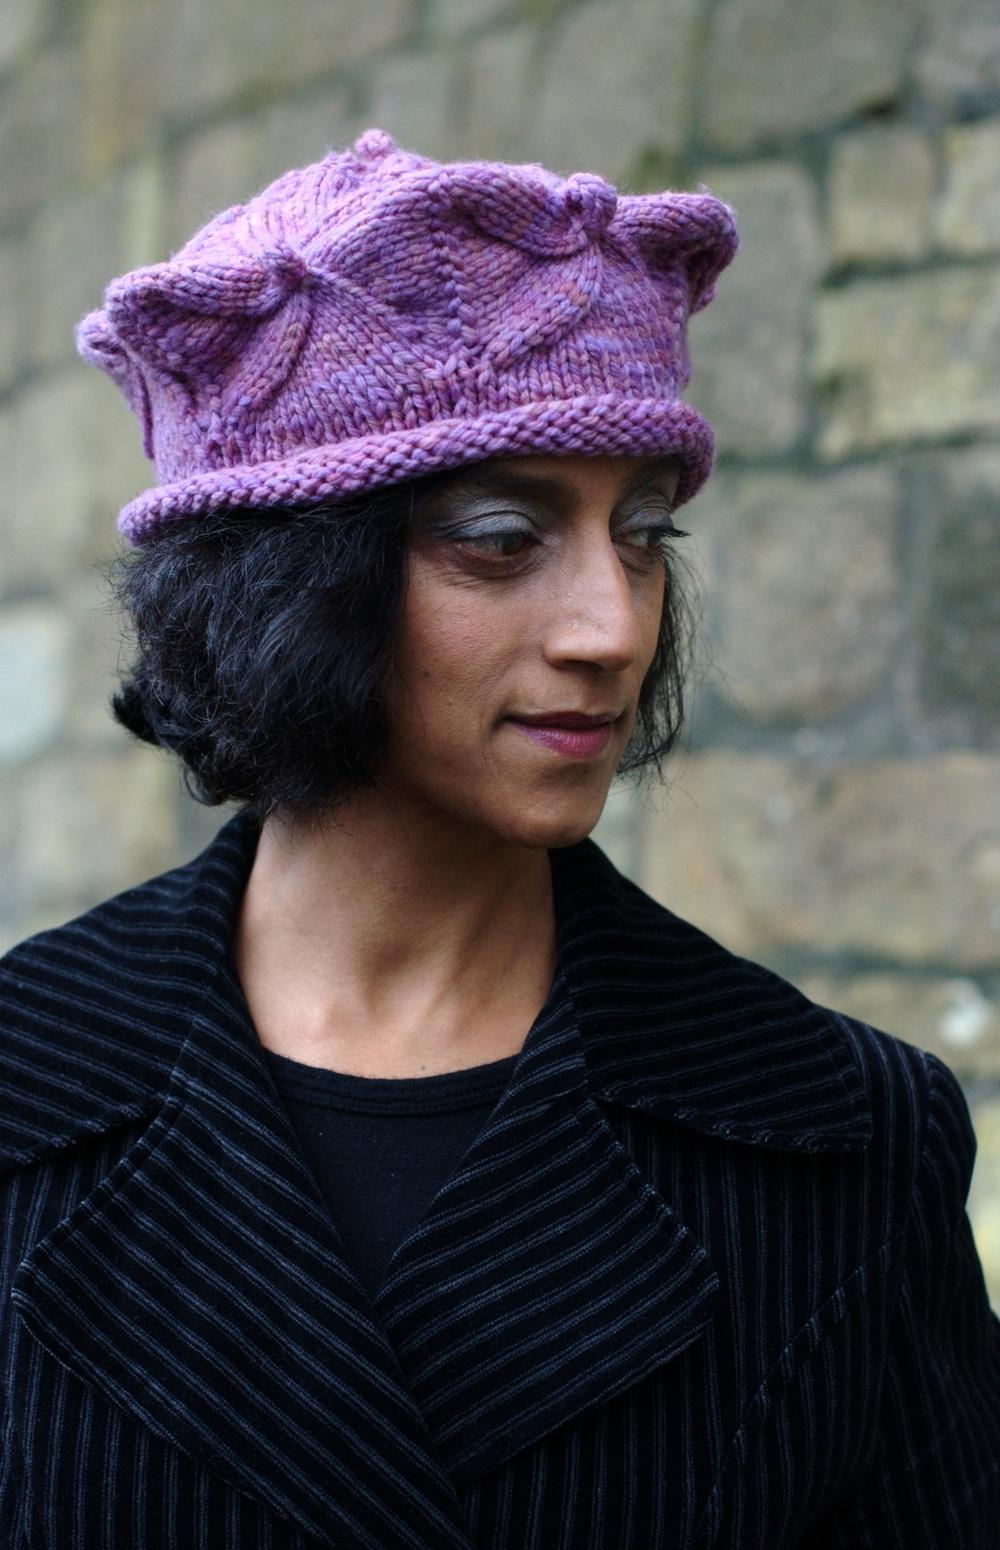 Tudor Cap sculptural Hat hand knitting pattern